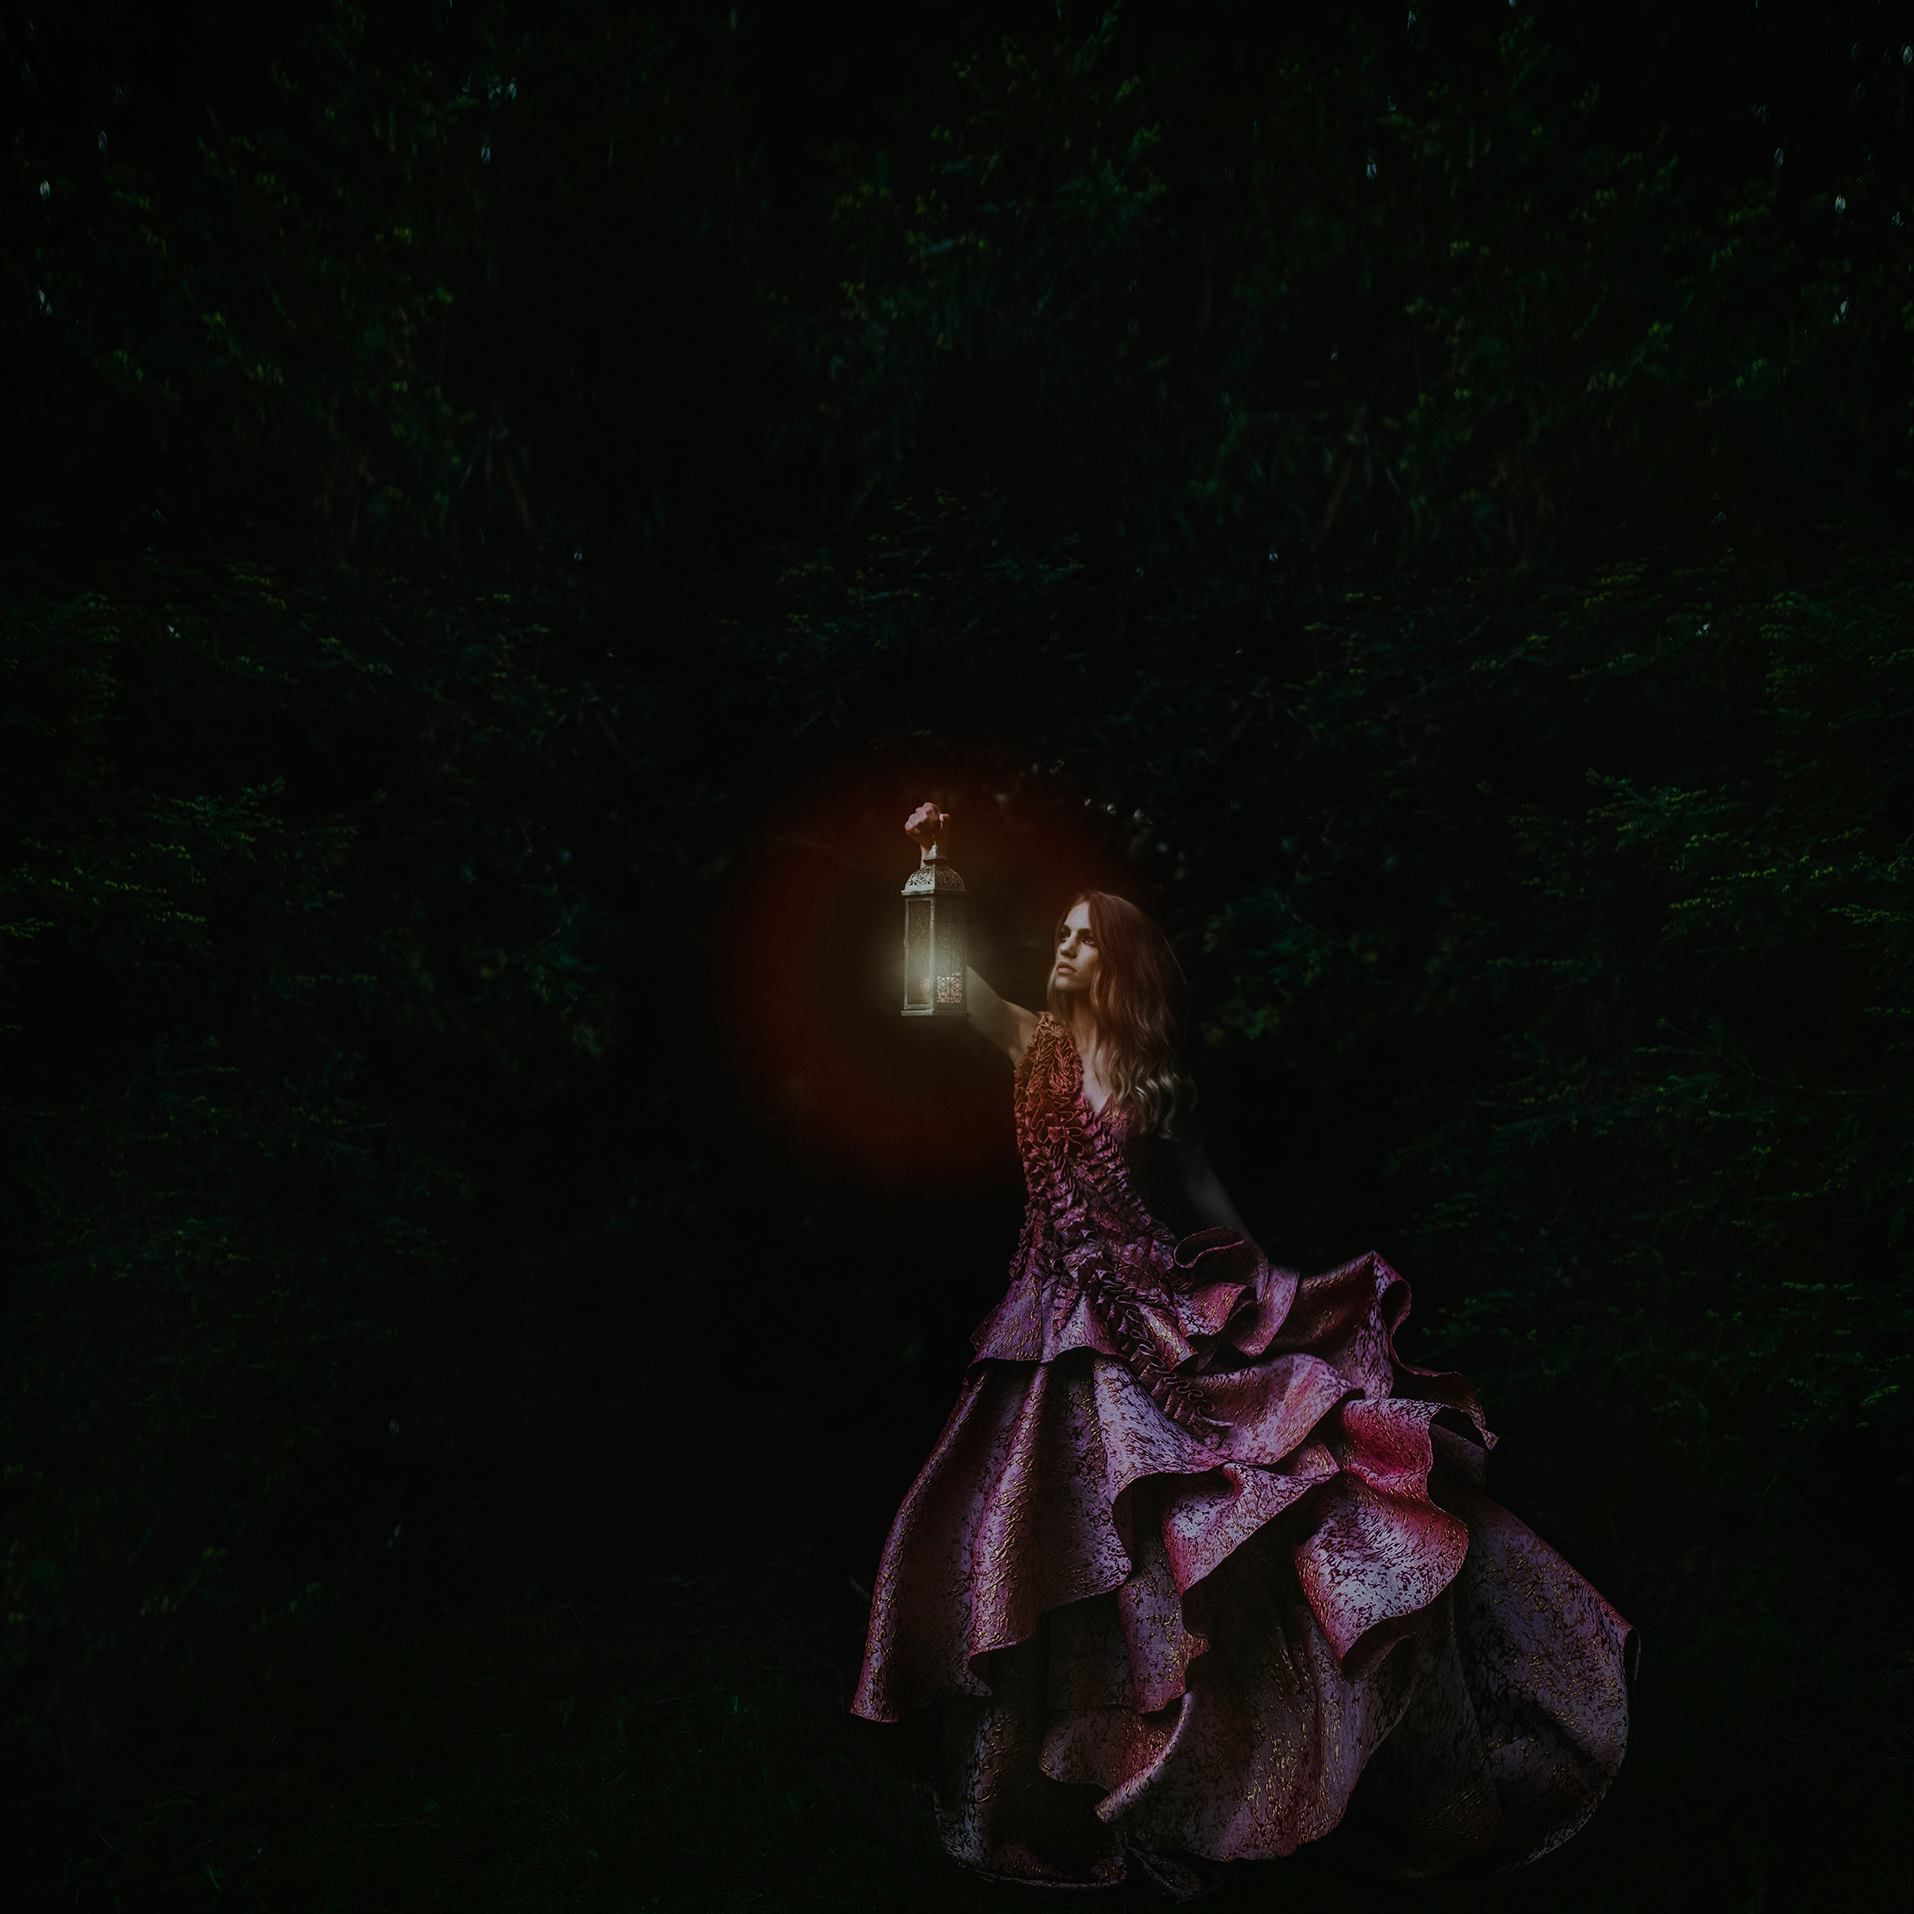 dawndra budd 6 - Emotional Storytelling with Twyla Jones - Wildest Dreams.jpg